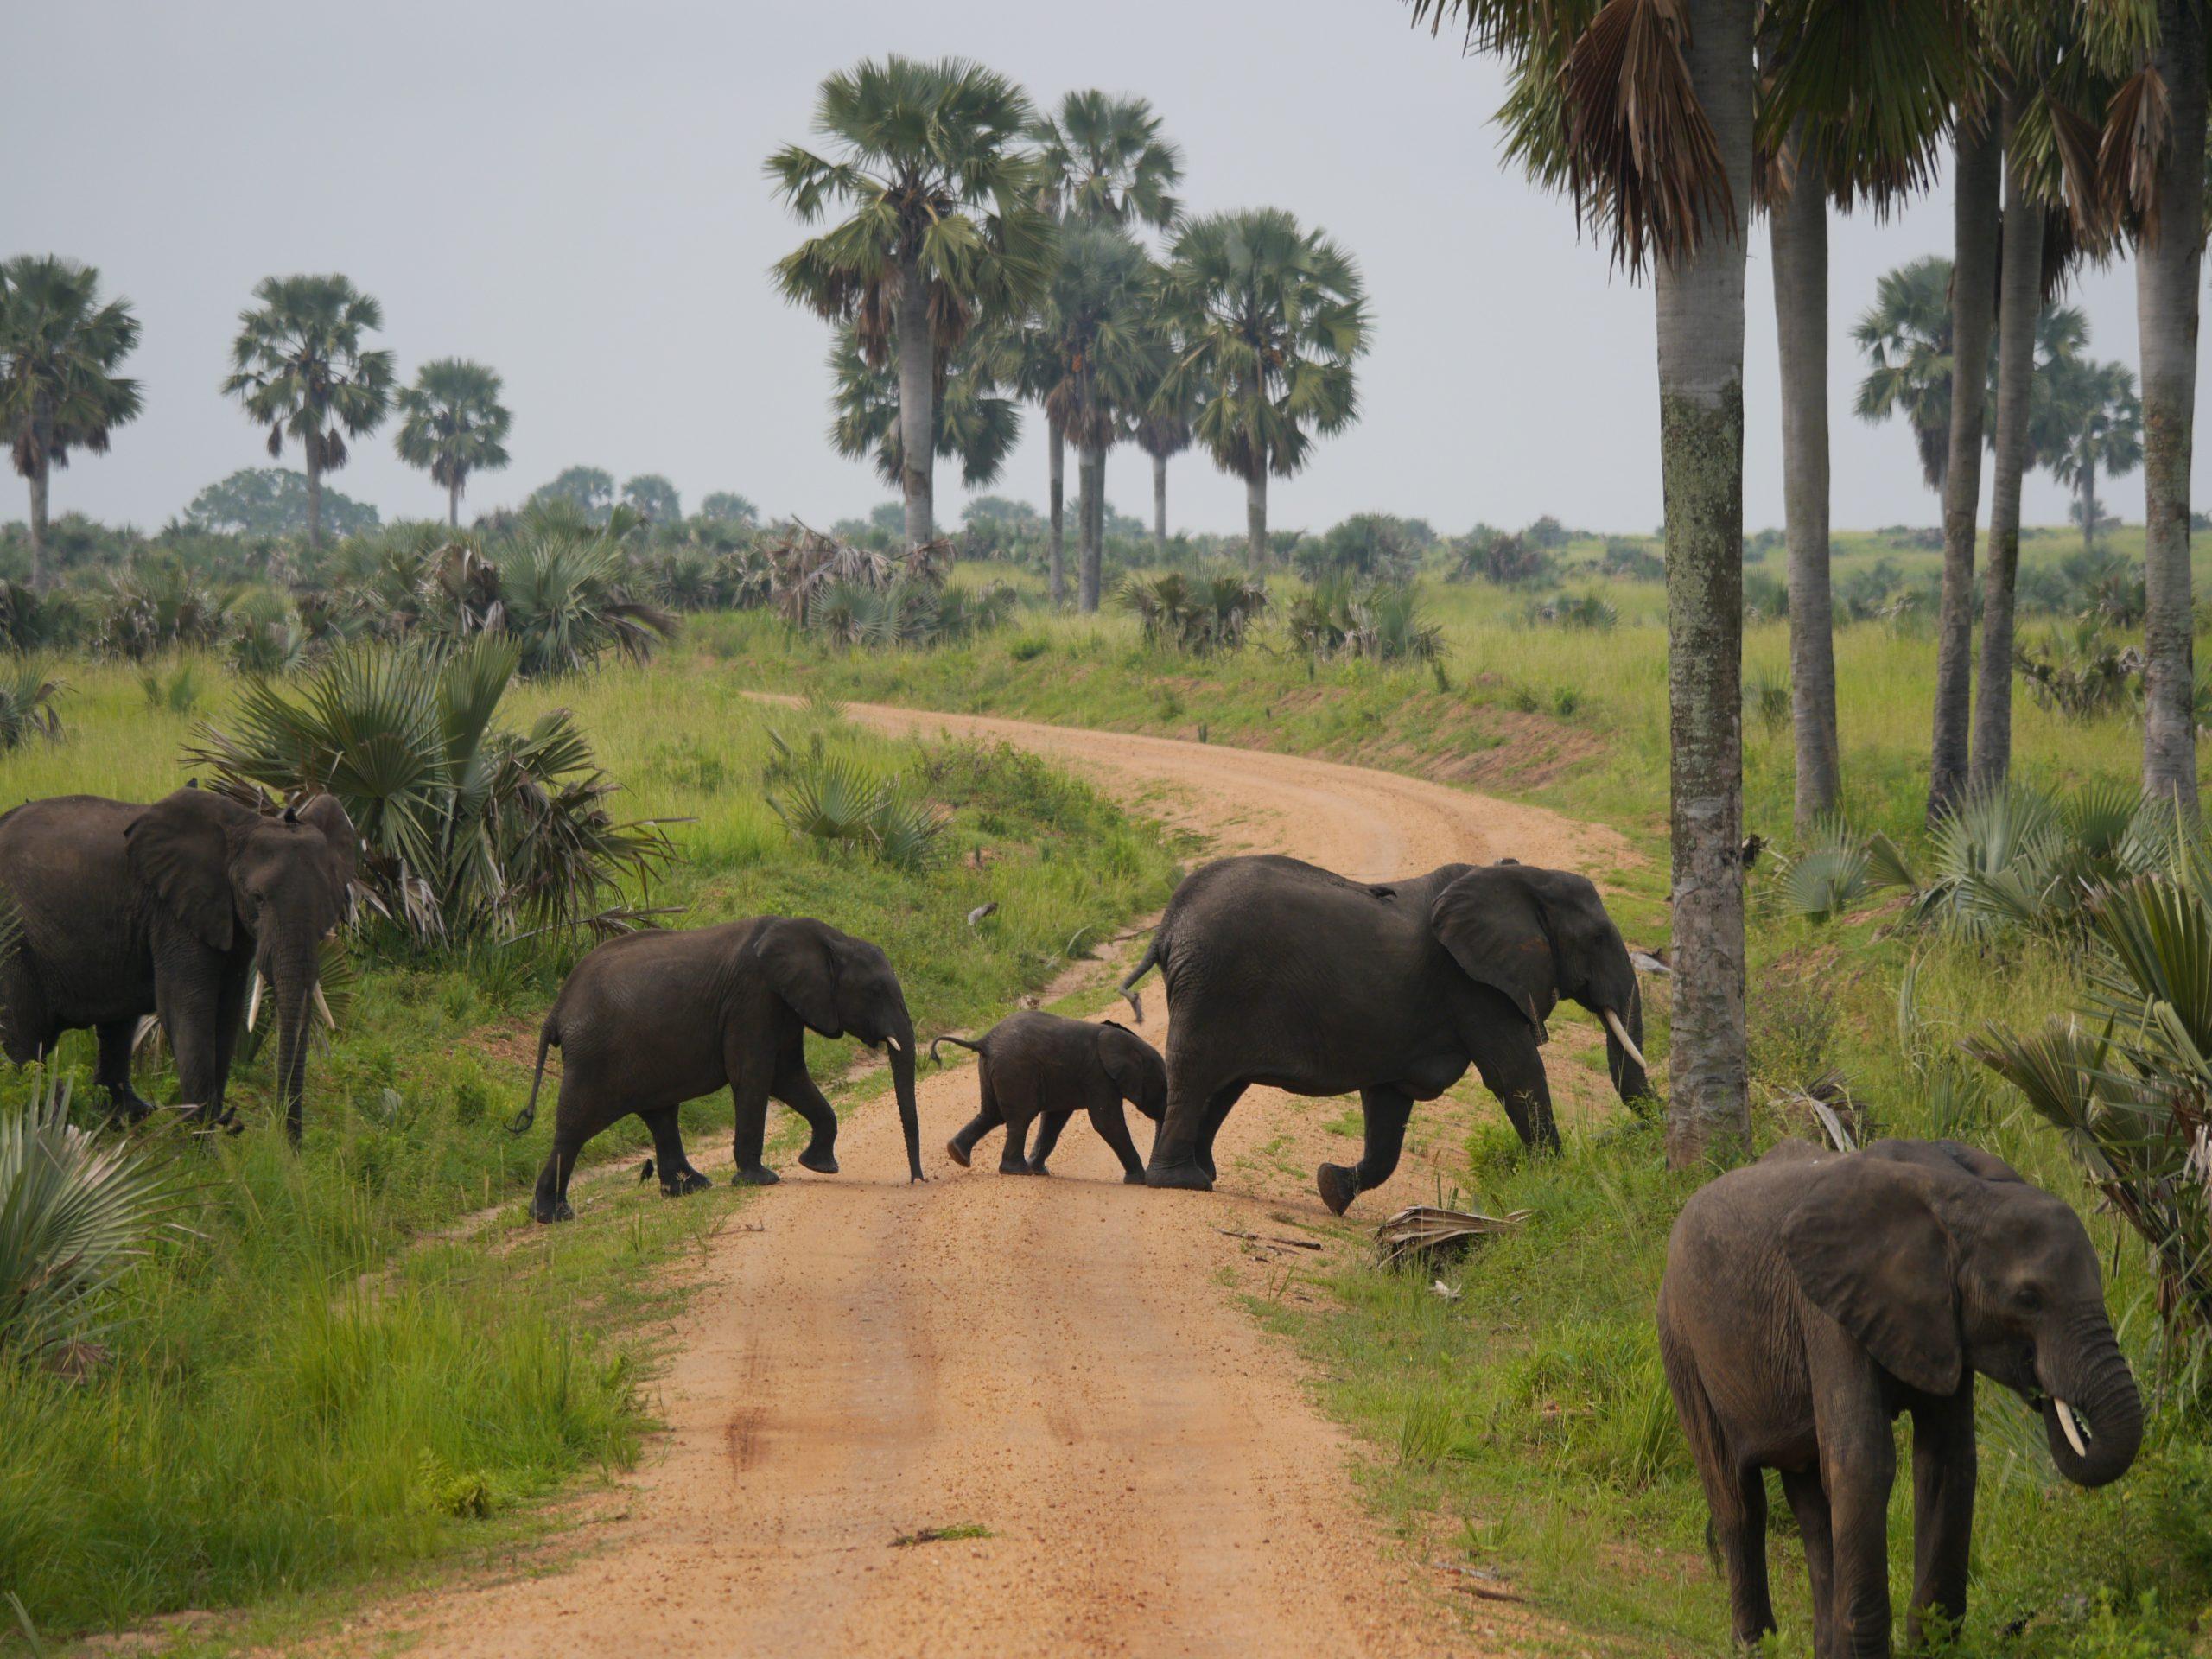 Elephants in Murchison Falls National Park Uganda